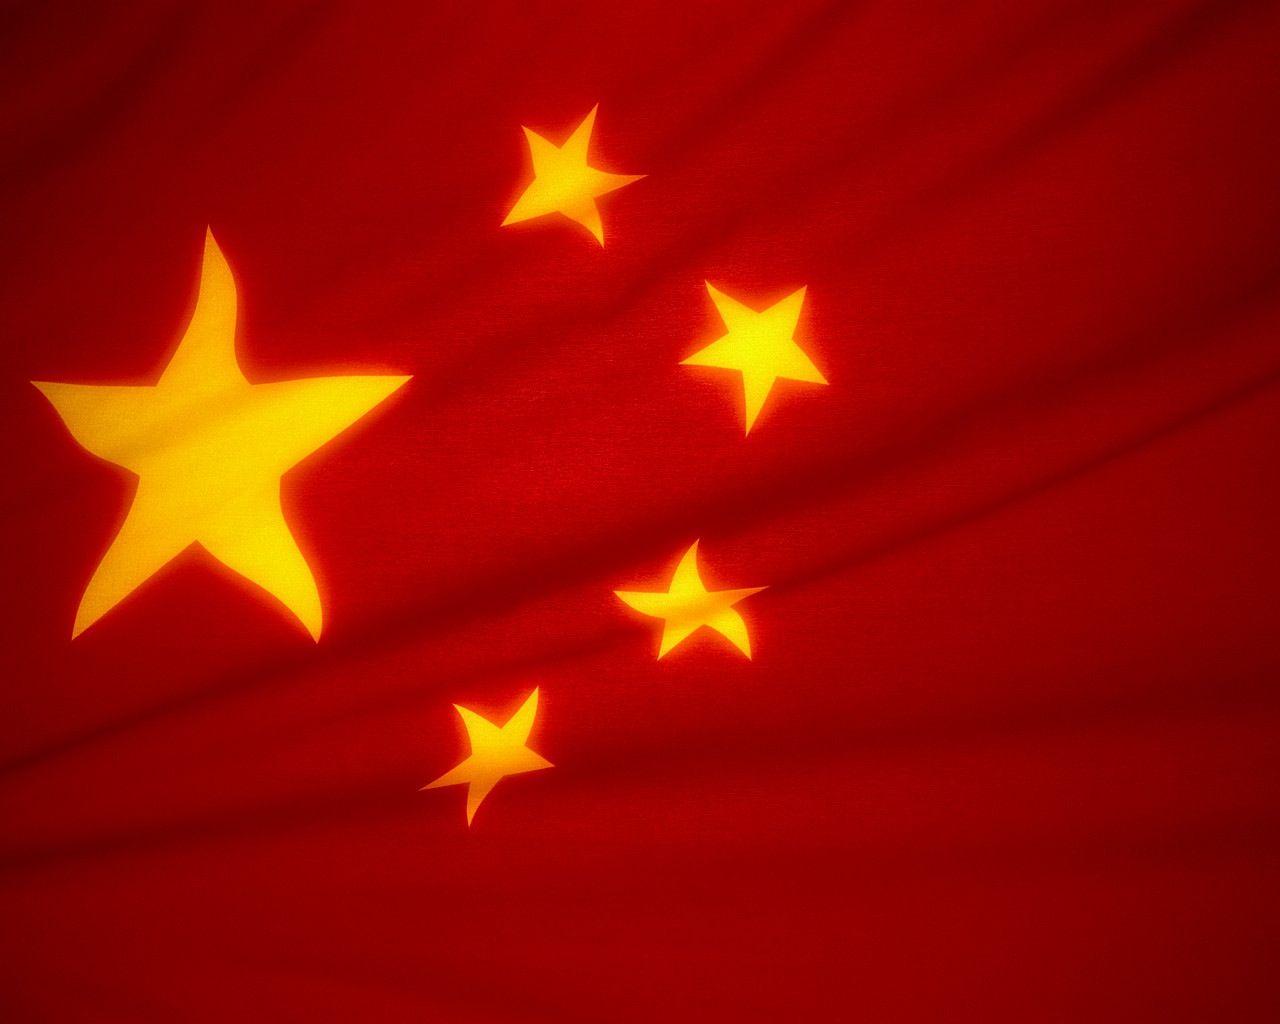 Pin By Stephen Wong On China China Culture China Flag Flag